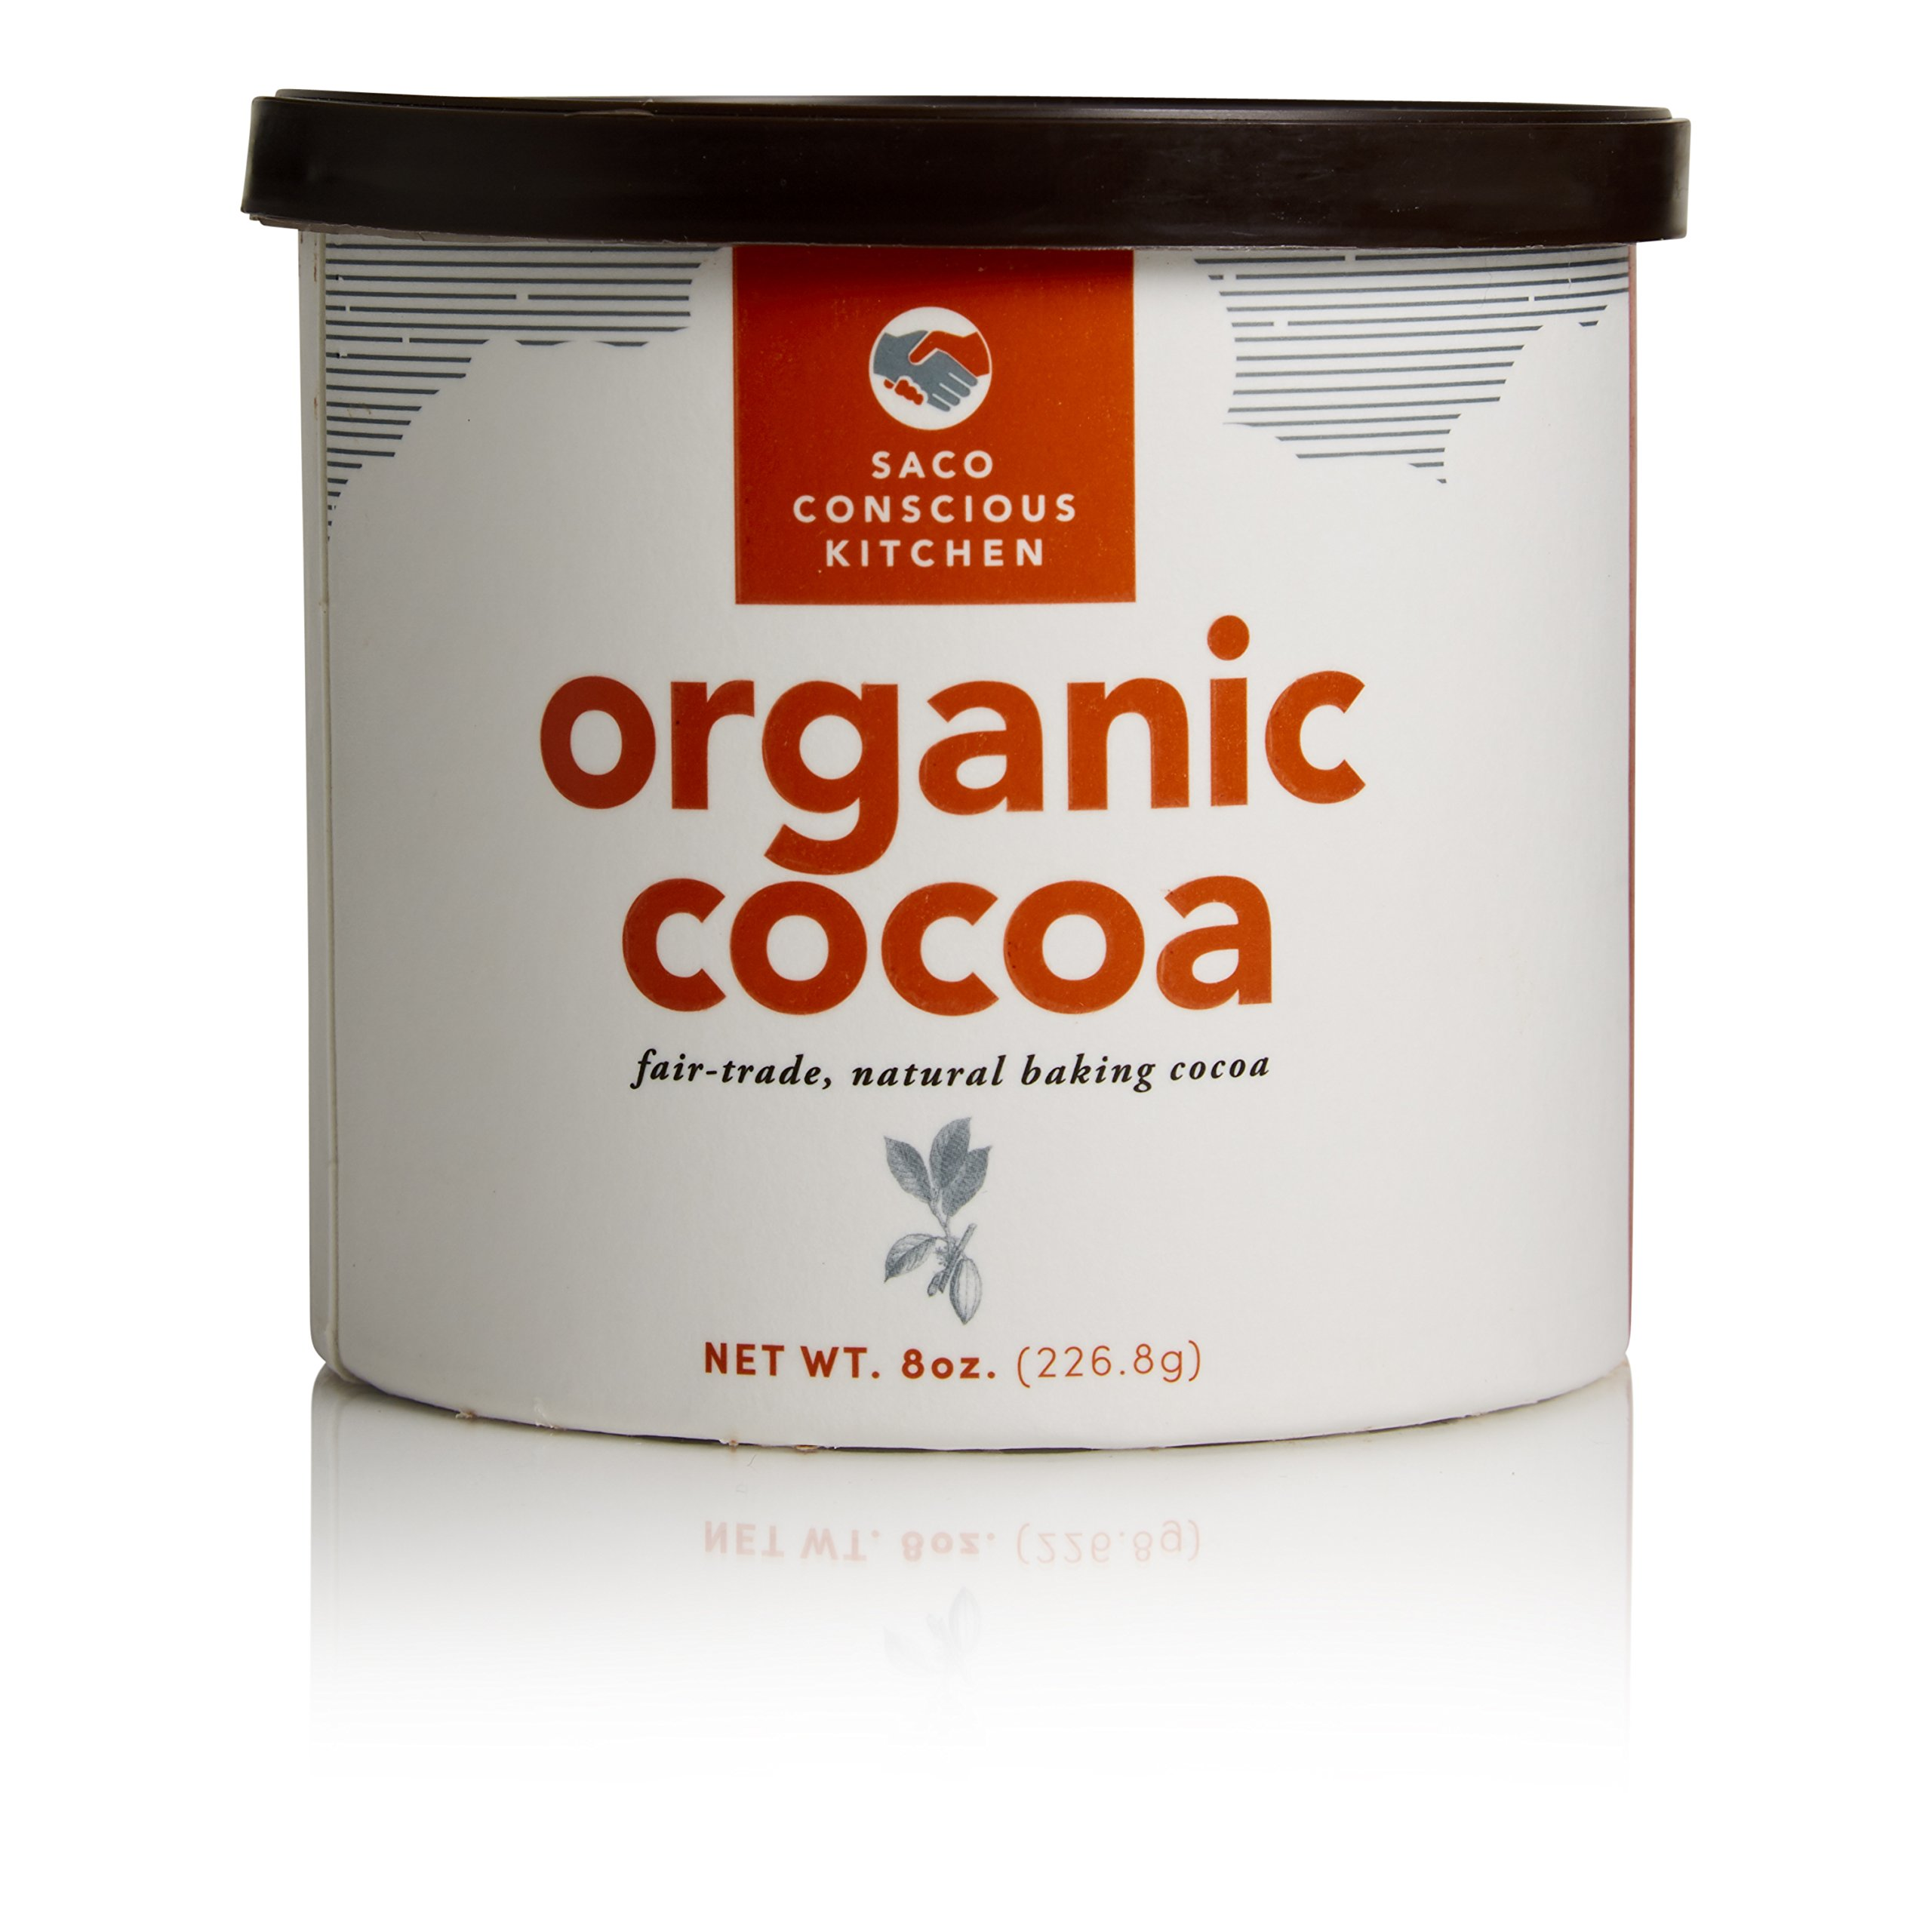 SACO Conscious Kitchen Certified Organic Cocoa, Fair-Trade, Natural Baking Cocoa, Gluten-Free, Nut-Free, Non-GMO, 8oz, Pack of 2